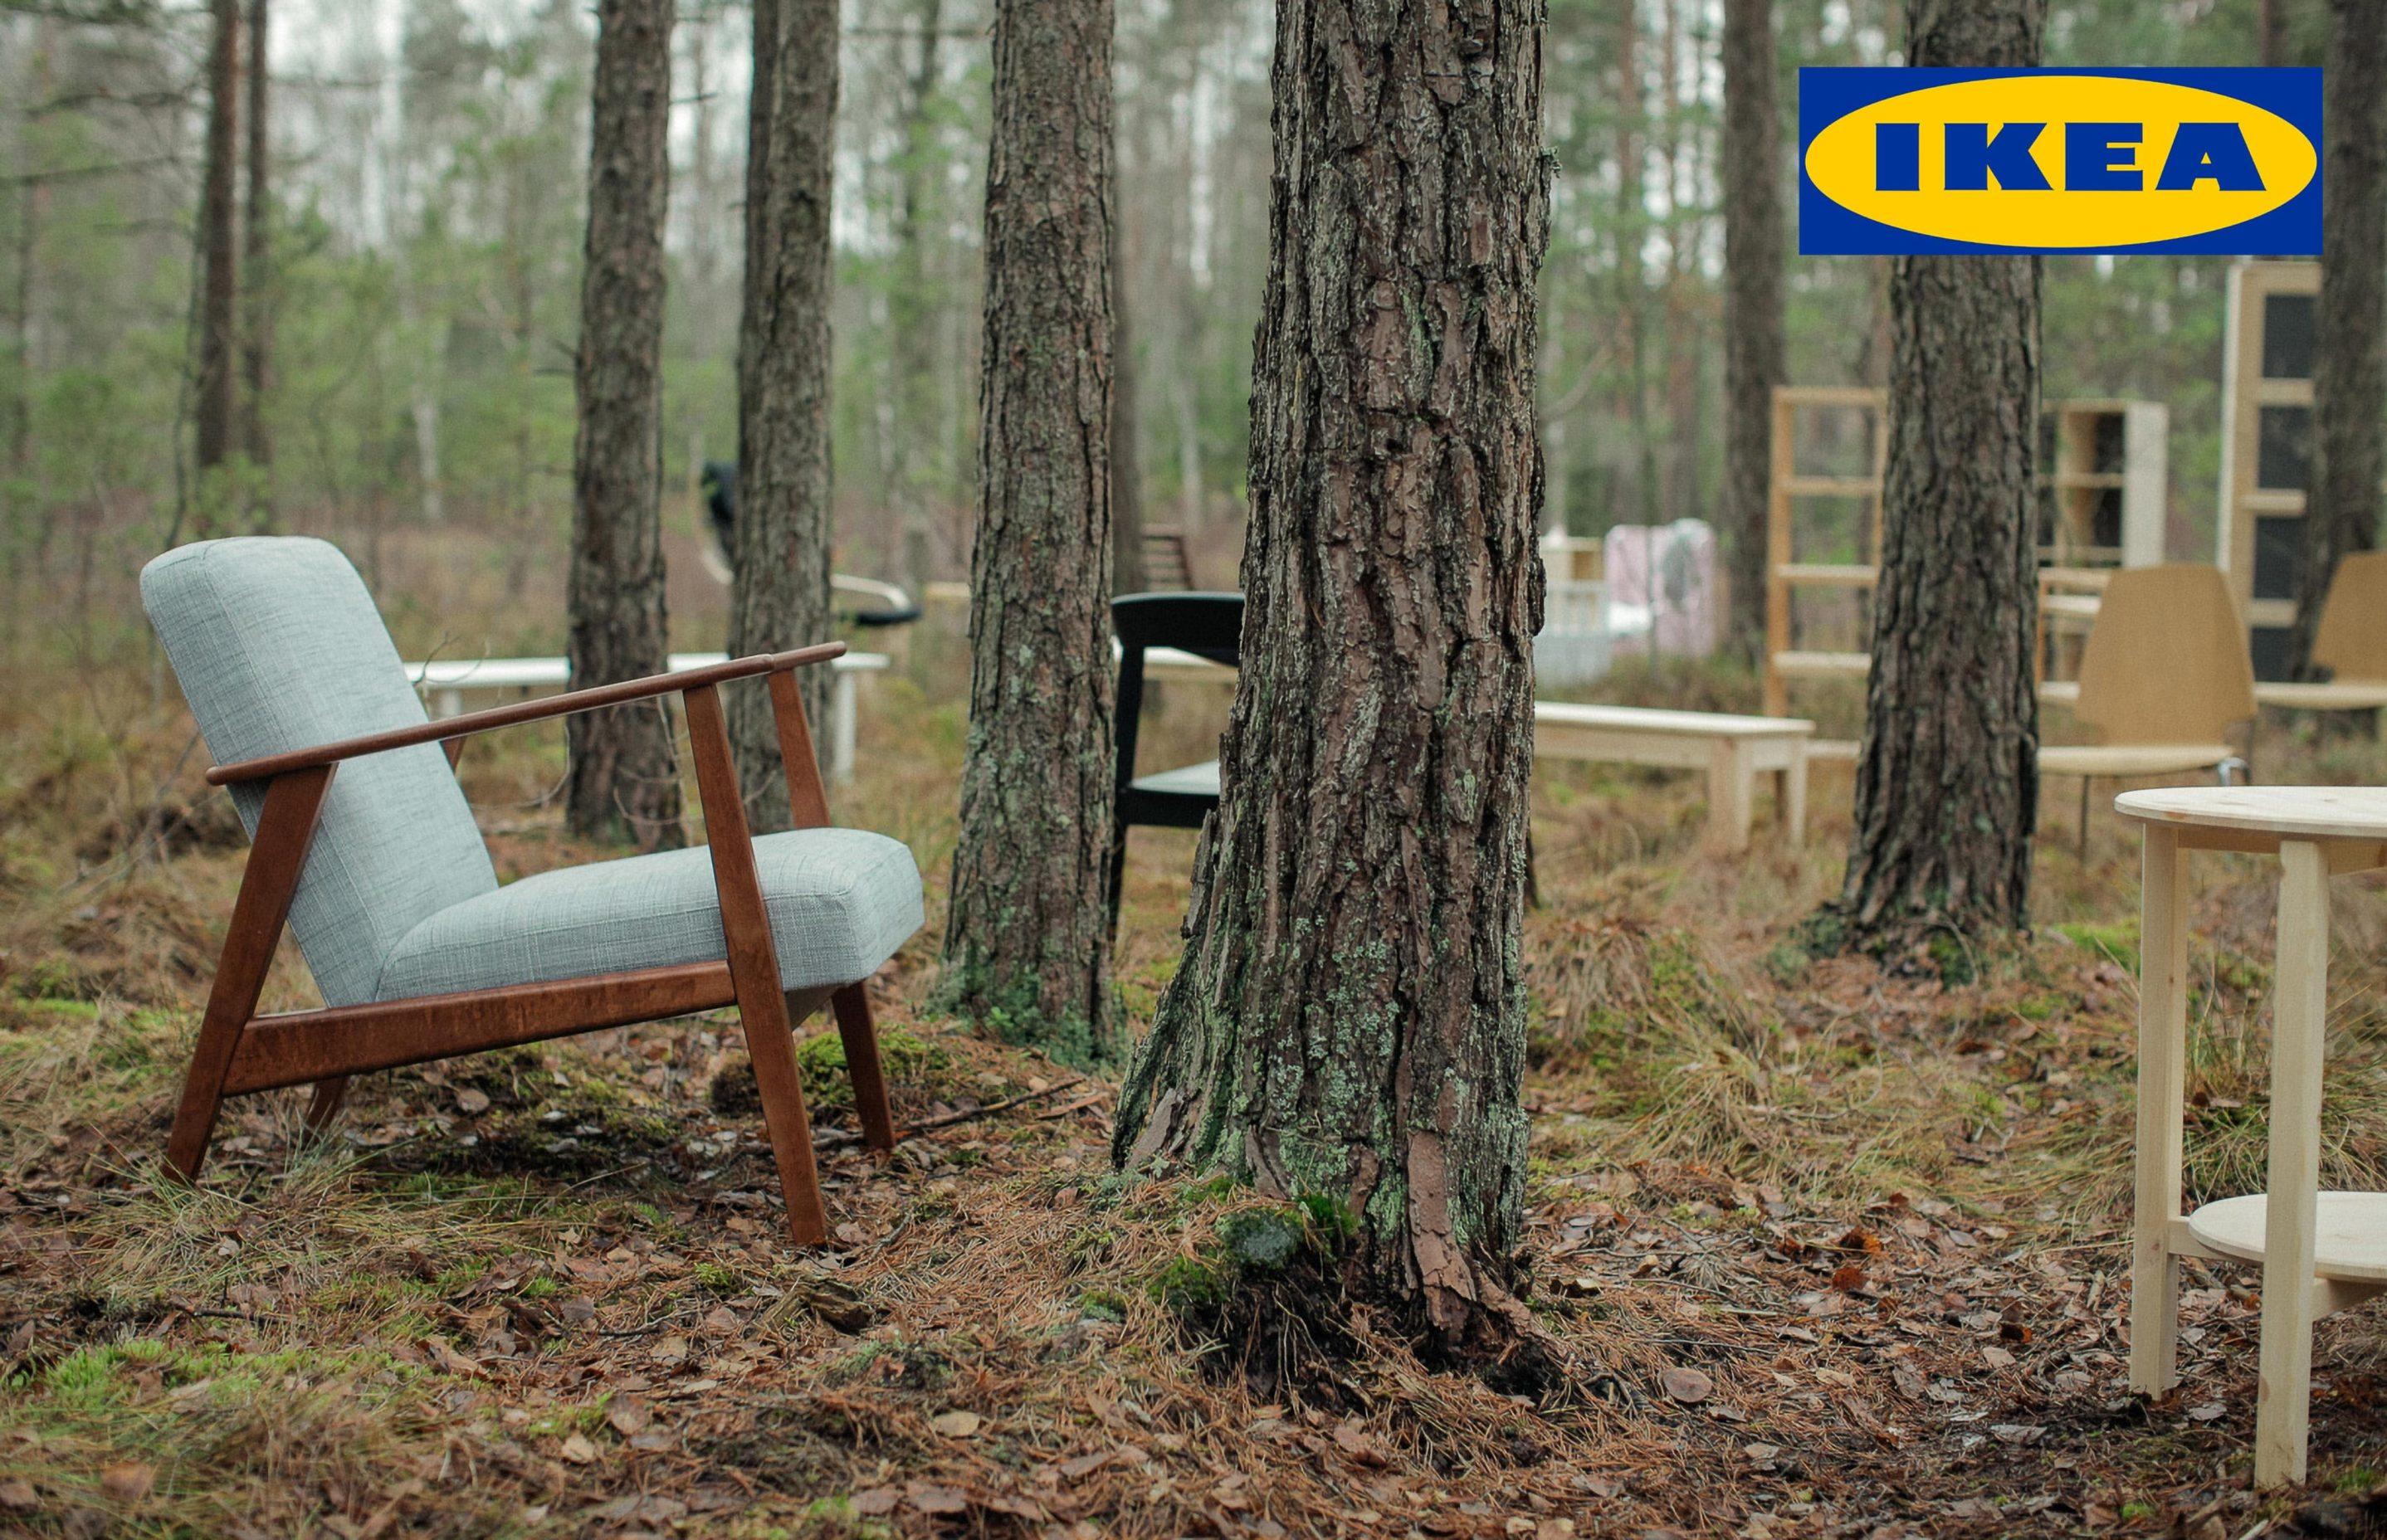 Ikea Forest Positive Joakim Sj 246 Gren